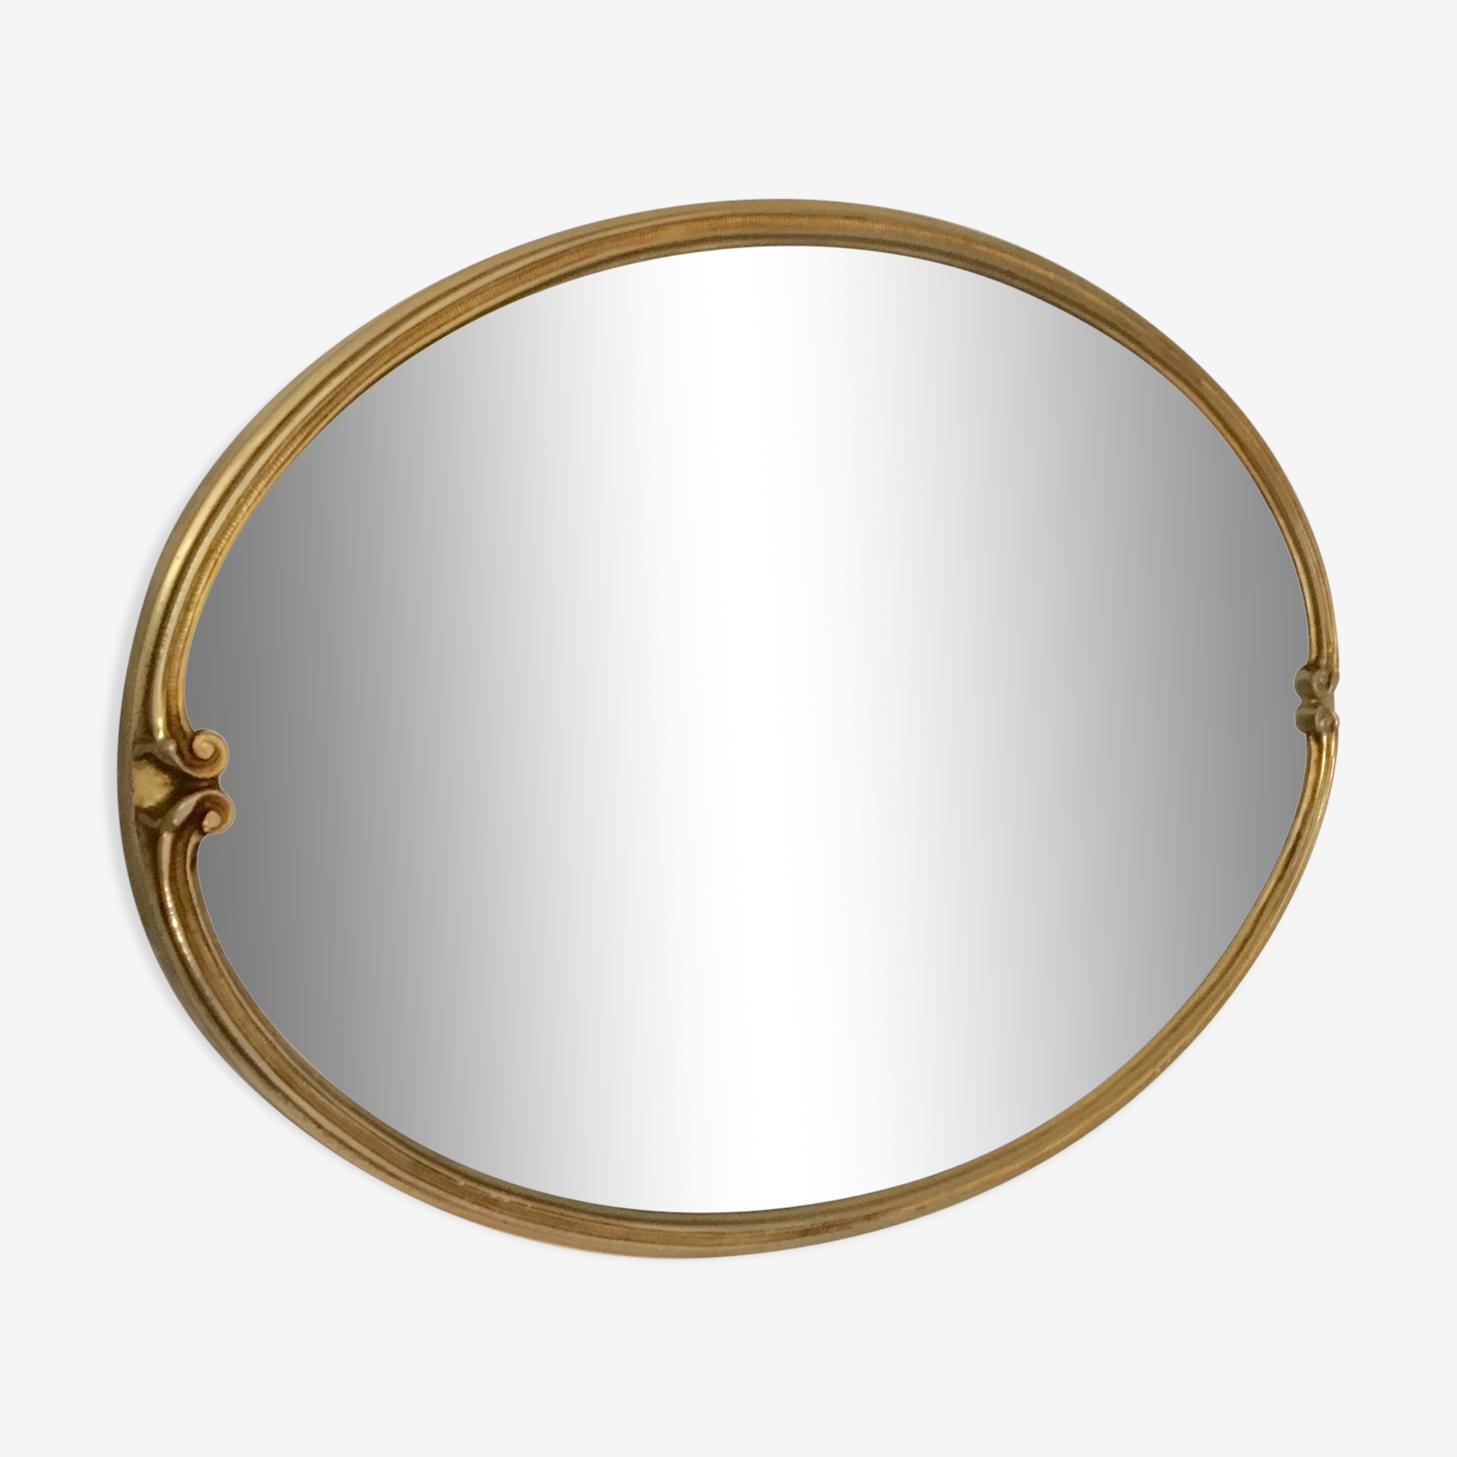 Oval mirror 41x57cm